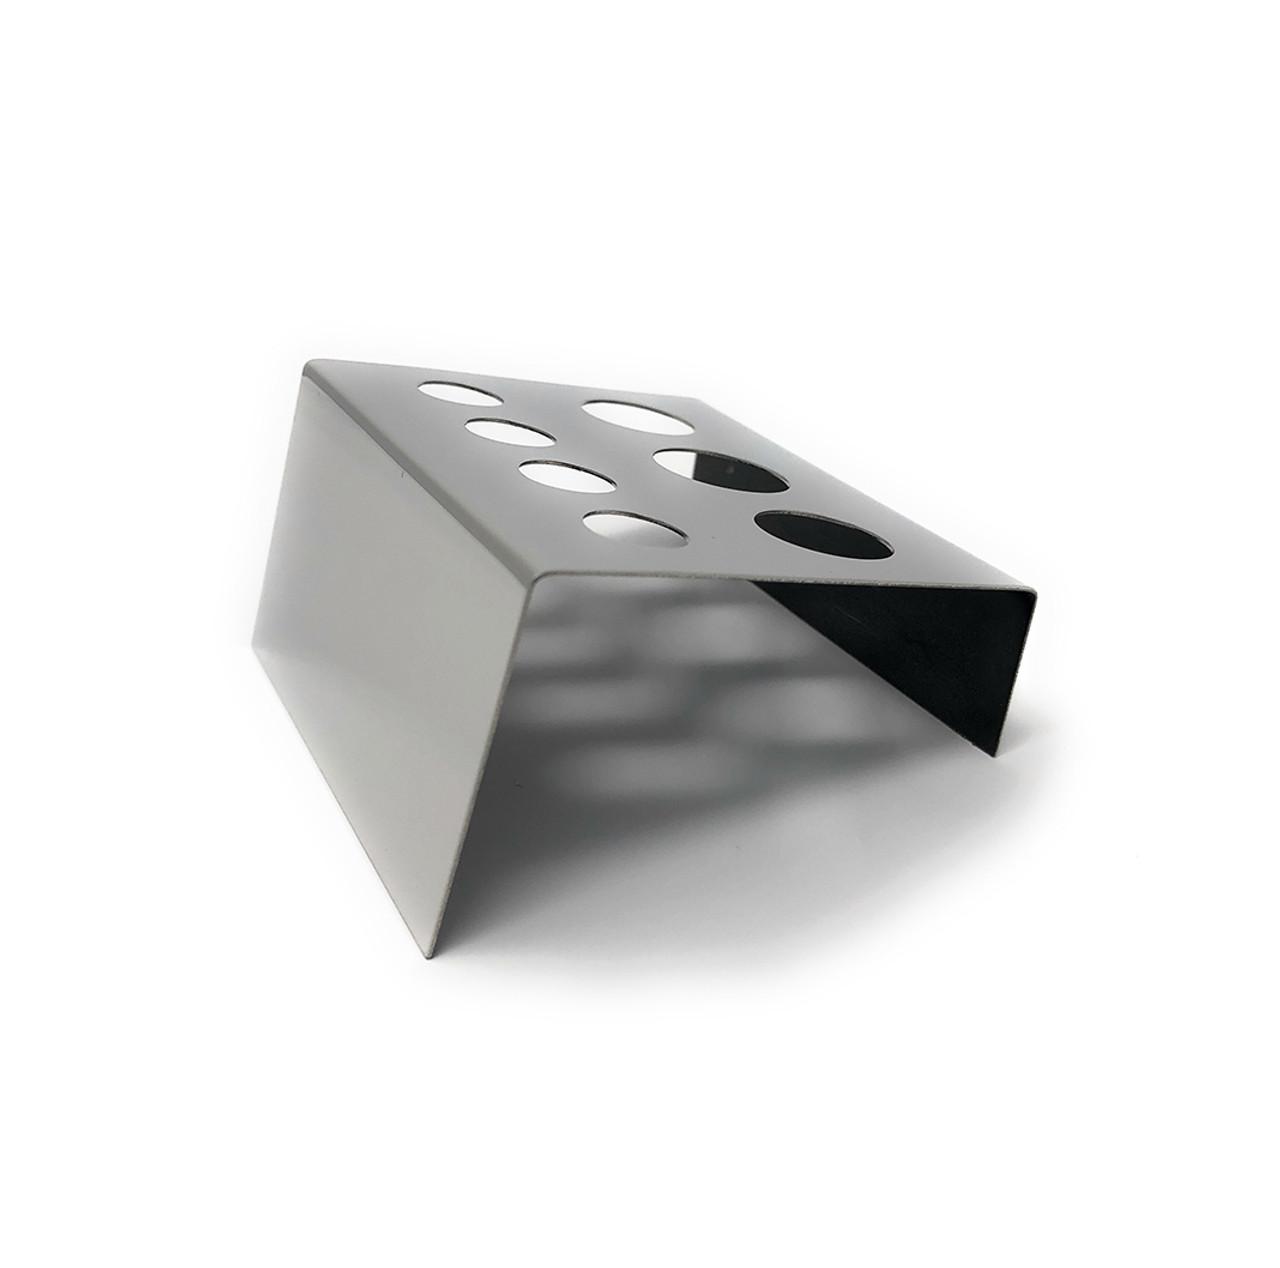 Stand Pigment Holder Shelf 7 holes